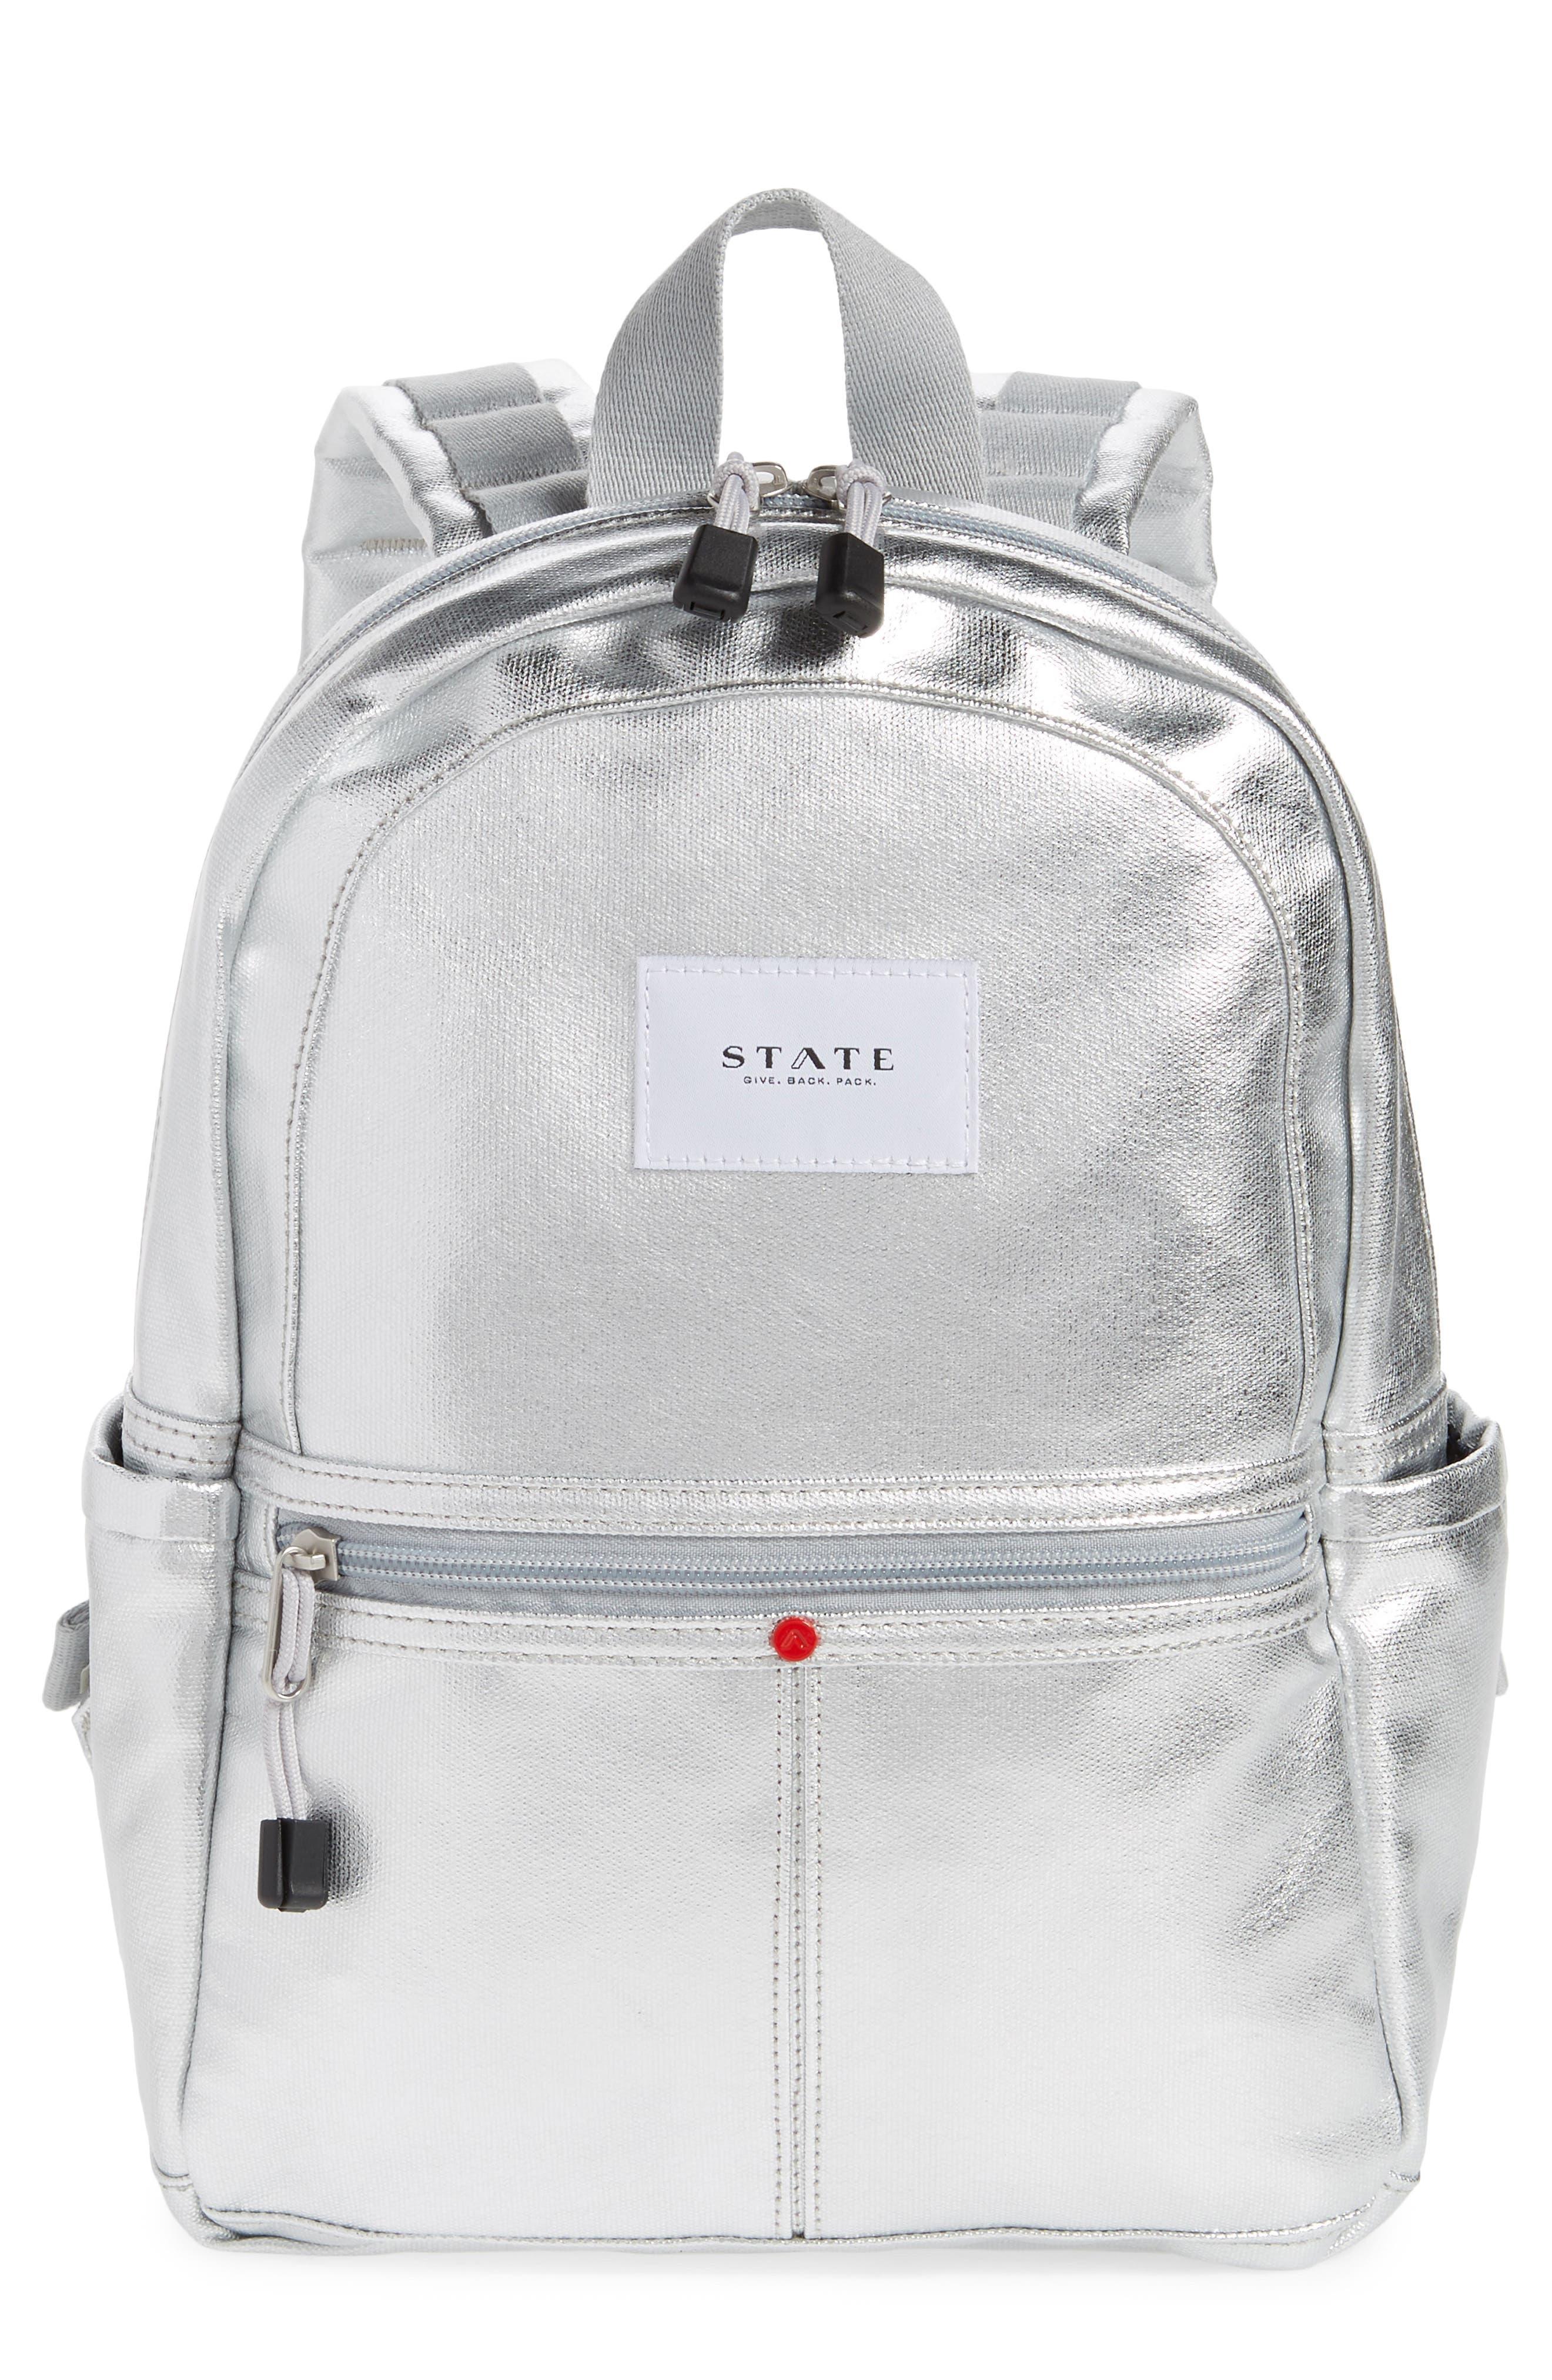 Downtown Mini Kane Canvas Backpack,                             Main thumbnail 1, color,                             Silver